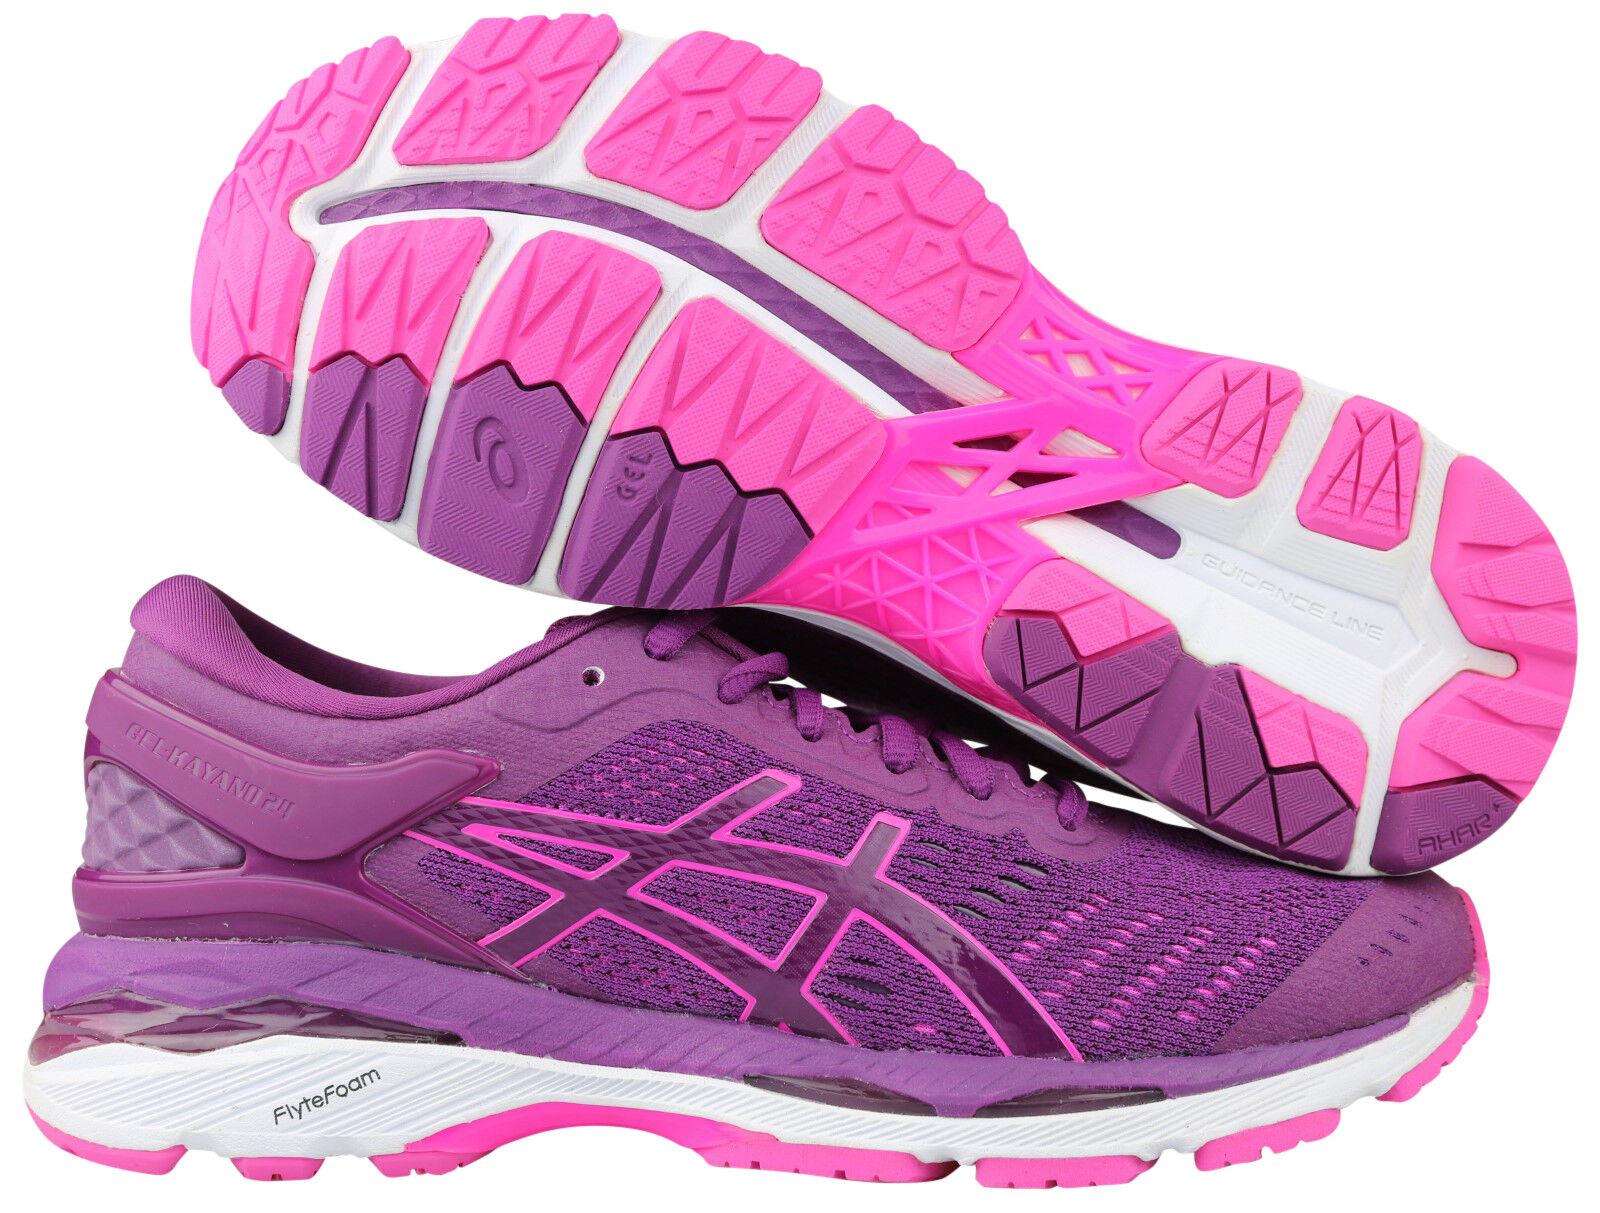 Asics Asics Asics Gel Kayano 24 Damen Running Laufschuhe lila T799N-3320 Gr. 36 - 42 NEU OVP 24f595